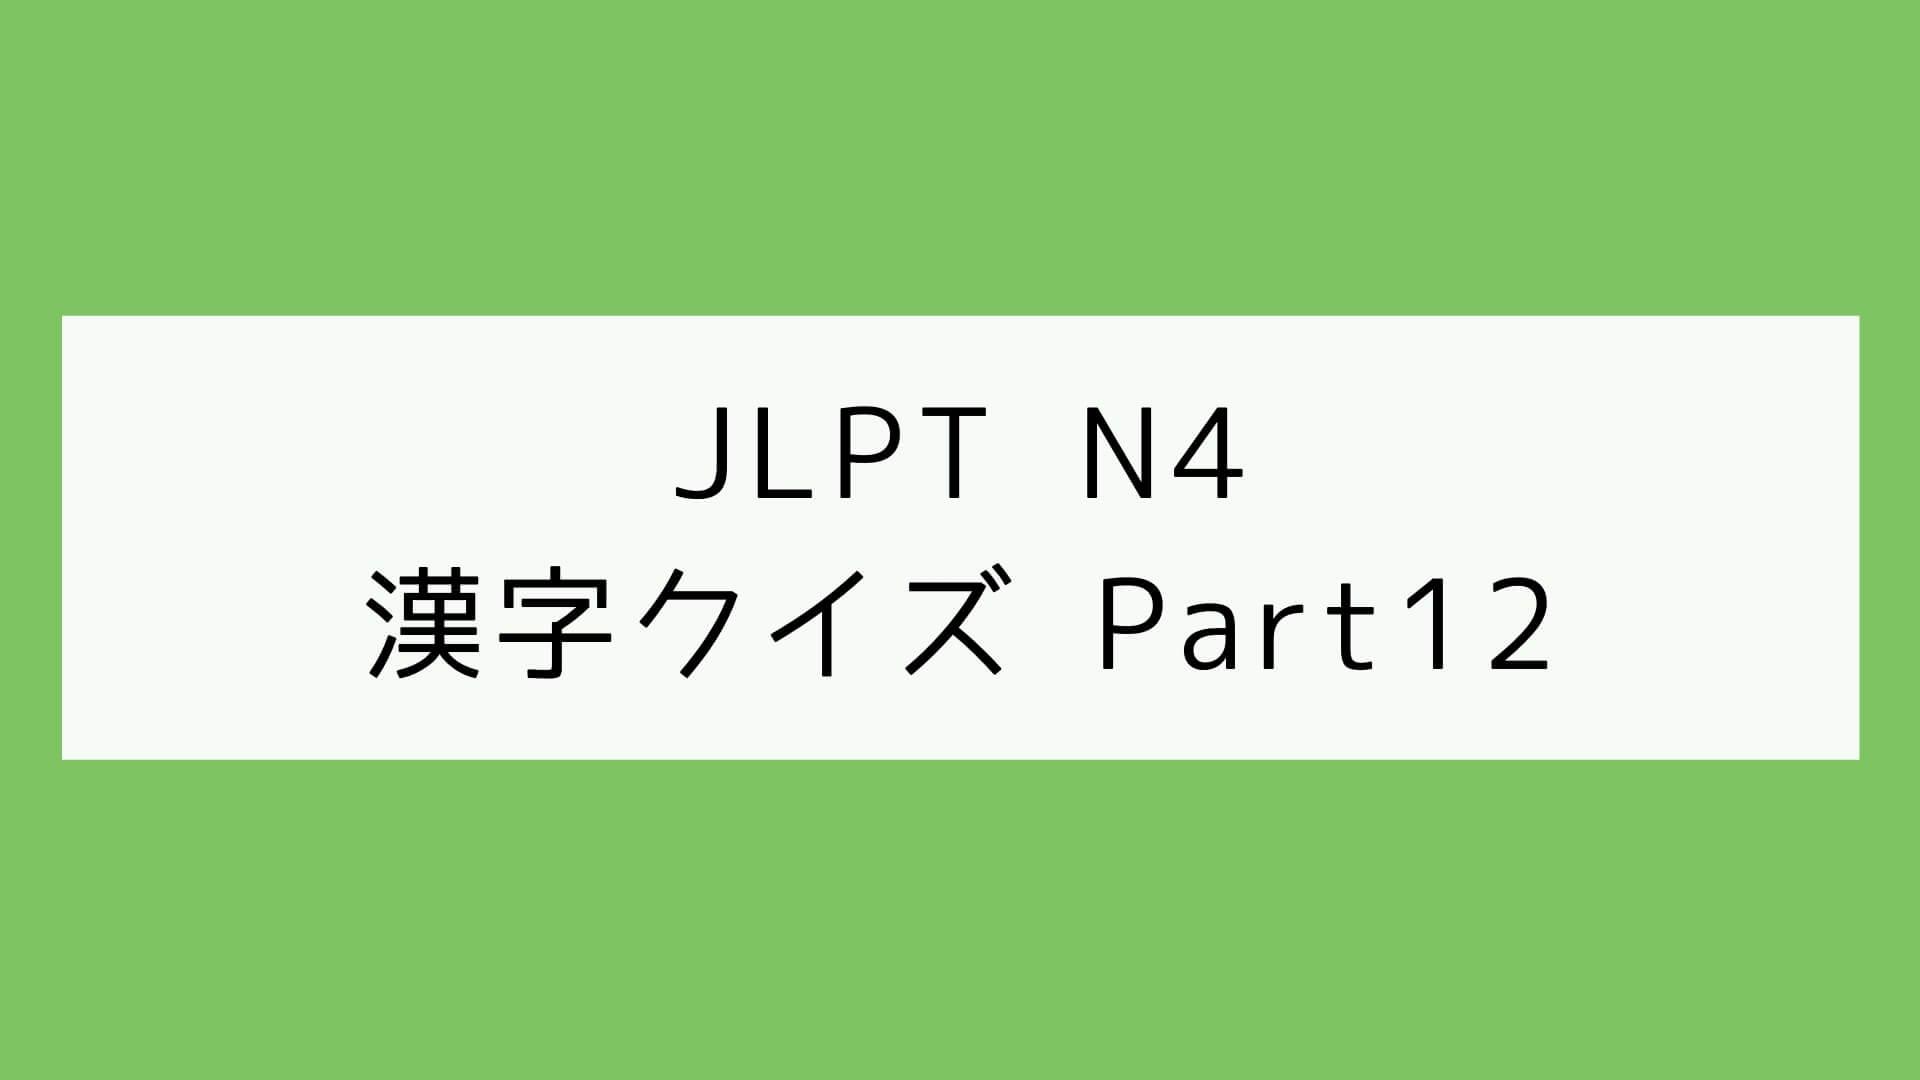 【JLPT N4】漢字クイズ Part12